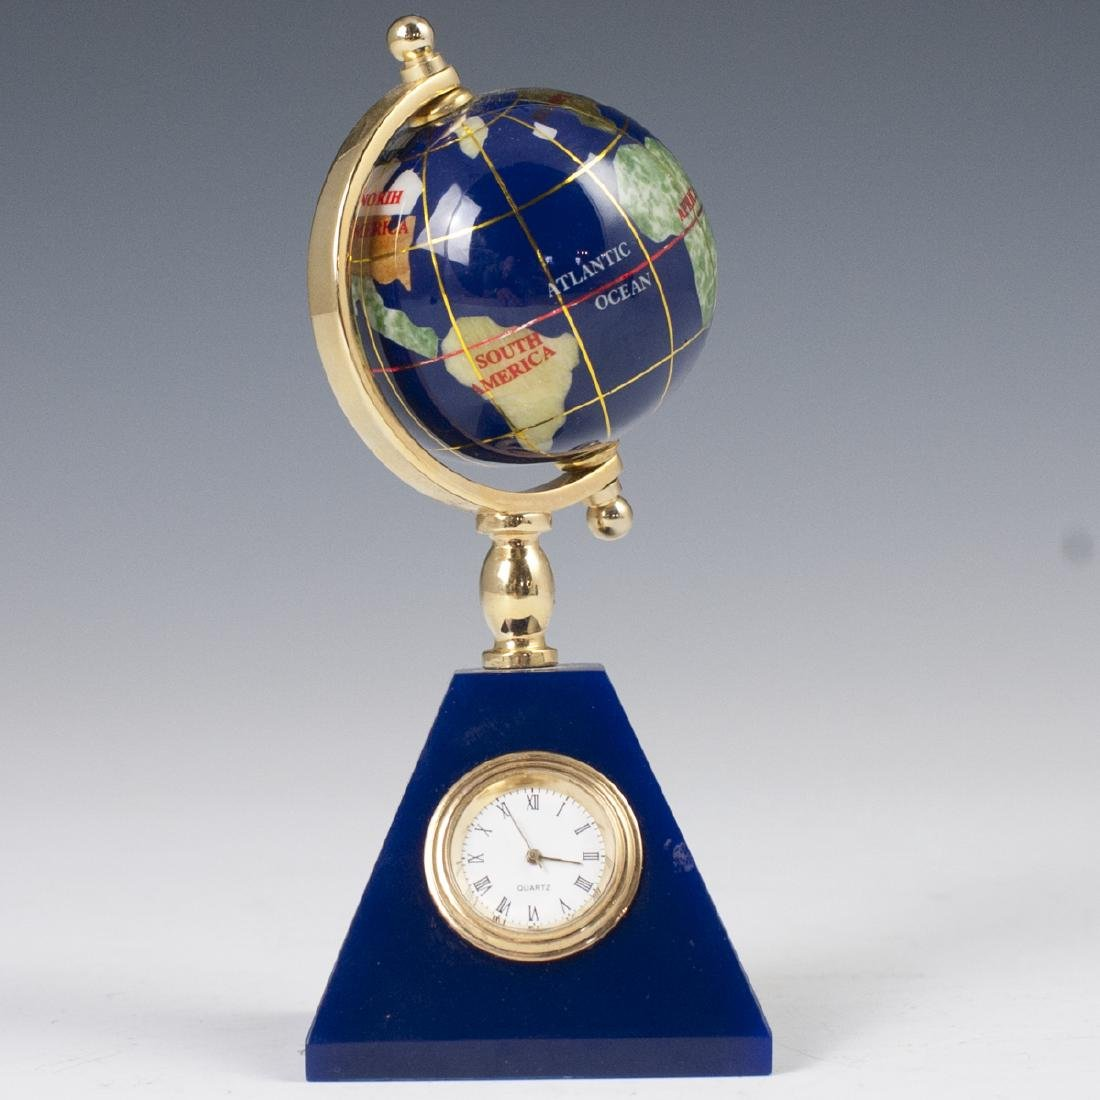 Vintage Semi-Precious Stone Globe Clock